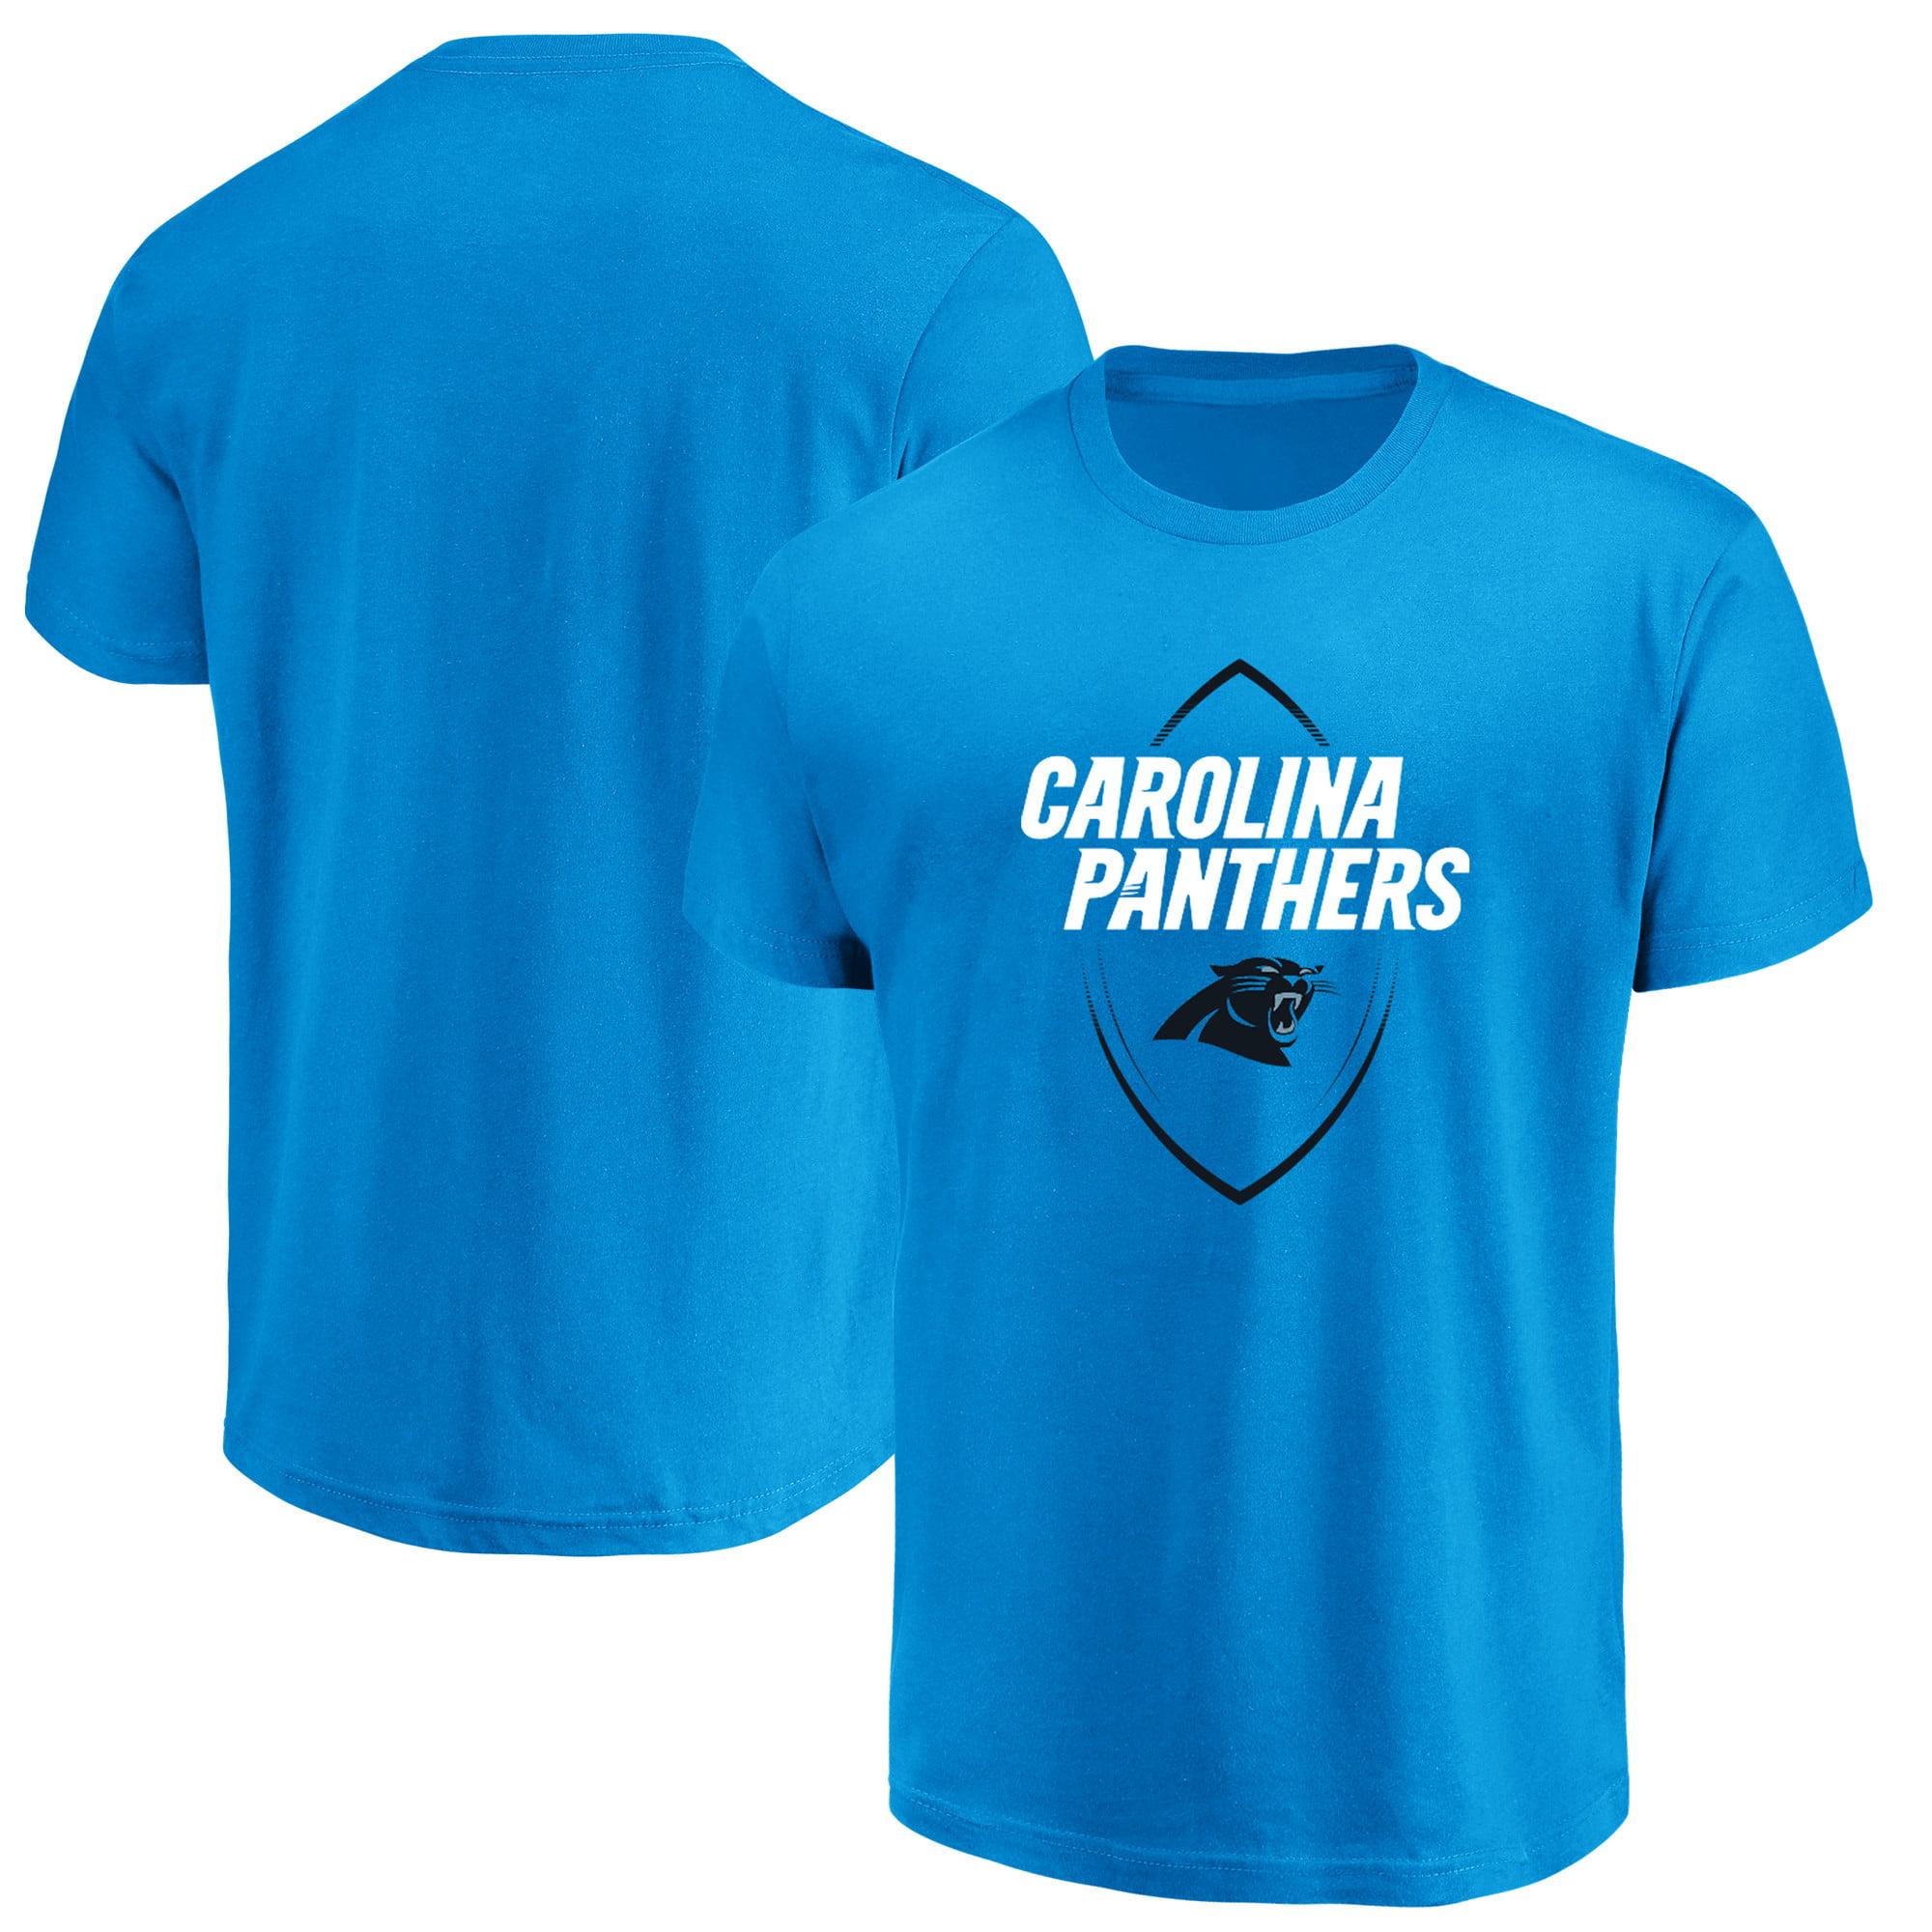 Carolina Panthers Majestic Maximized Crew Neck T-Shirt - Blue